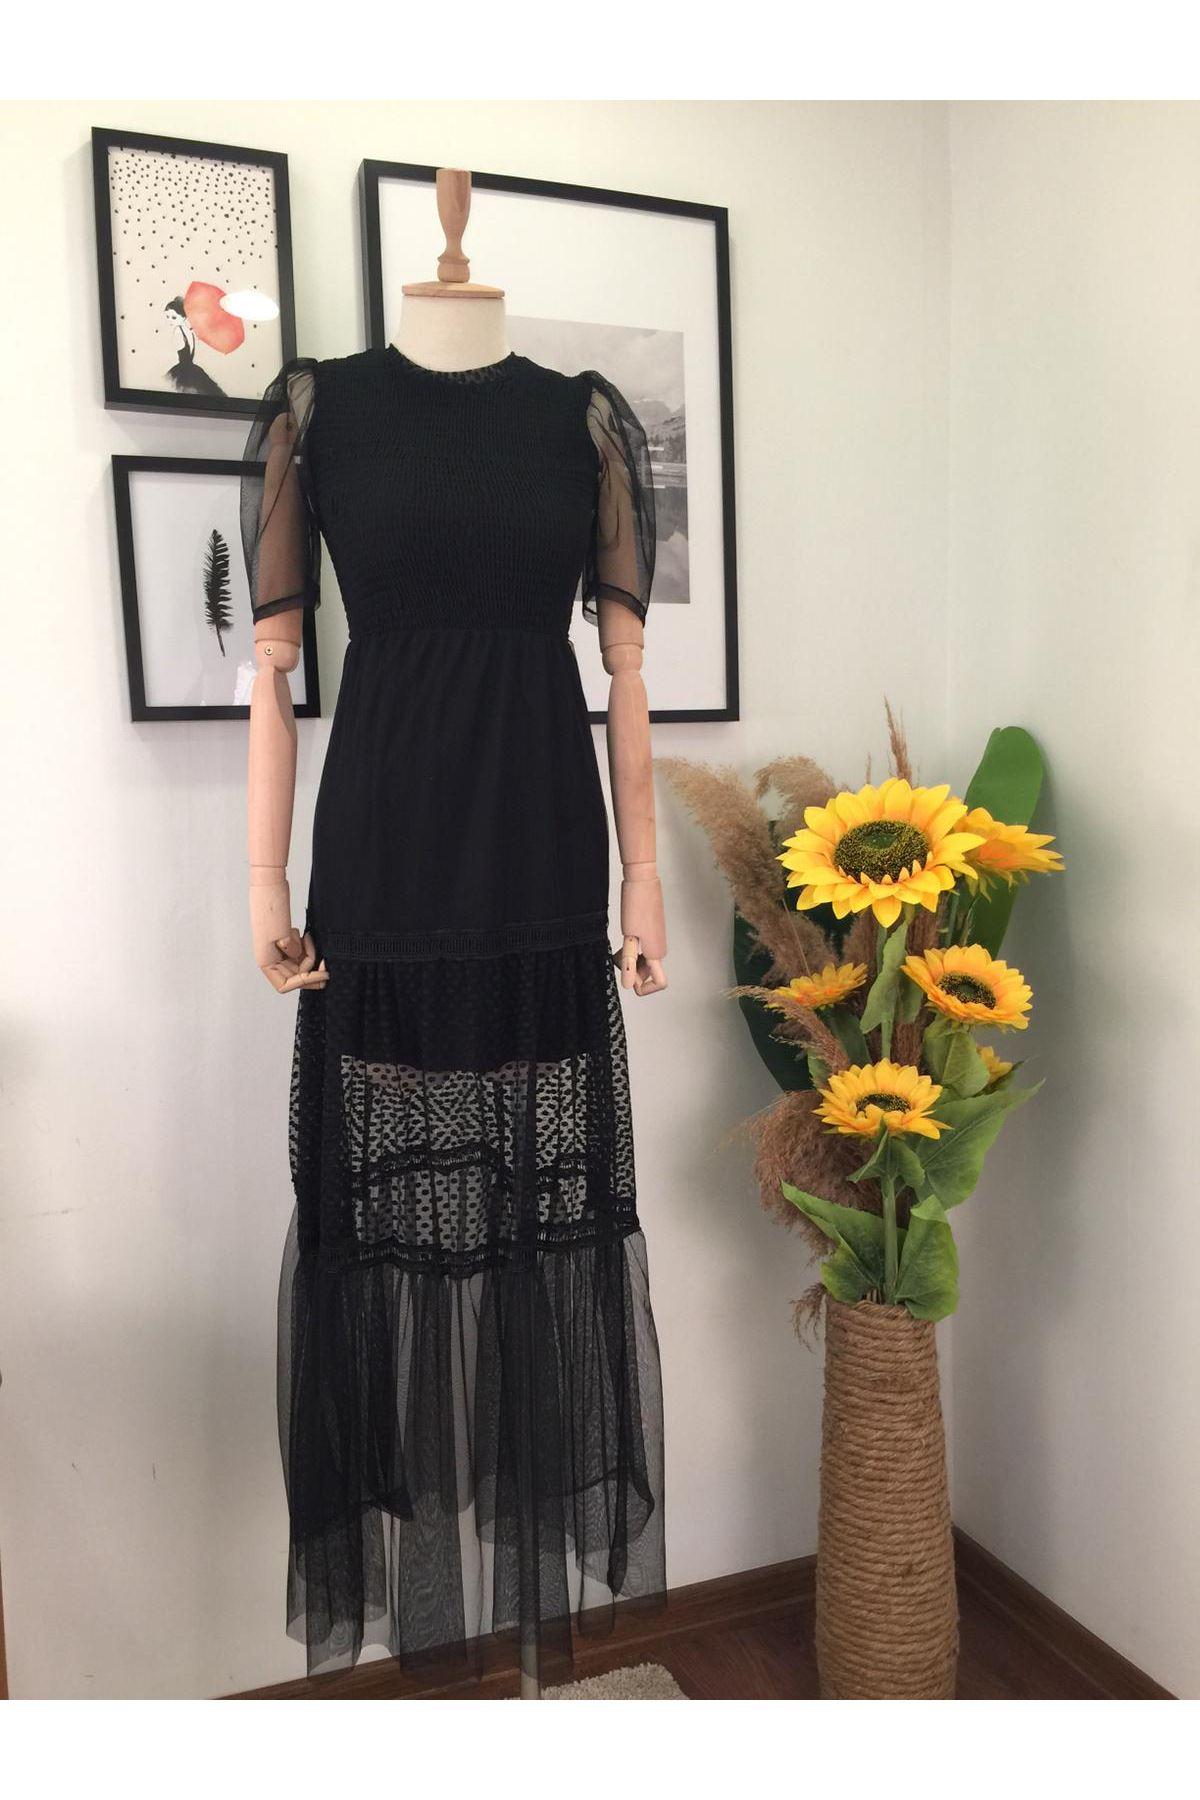 Göğüs Gipeli Etek Ve Kol Tül Detaylı Elbise VS213 SİYAH